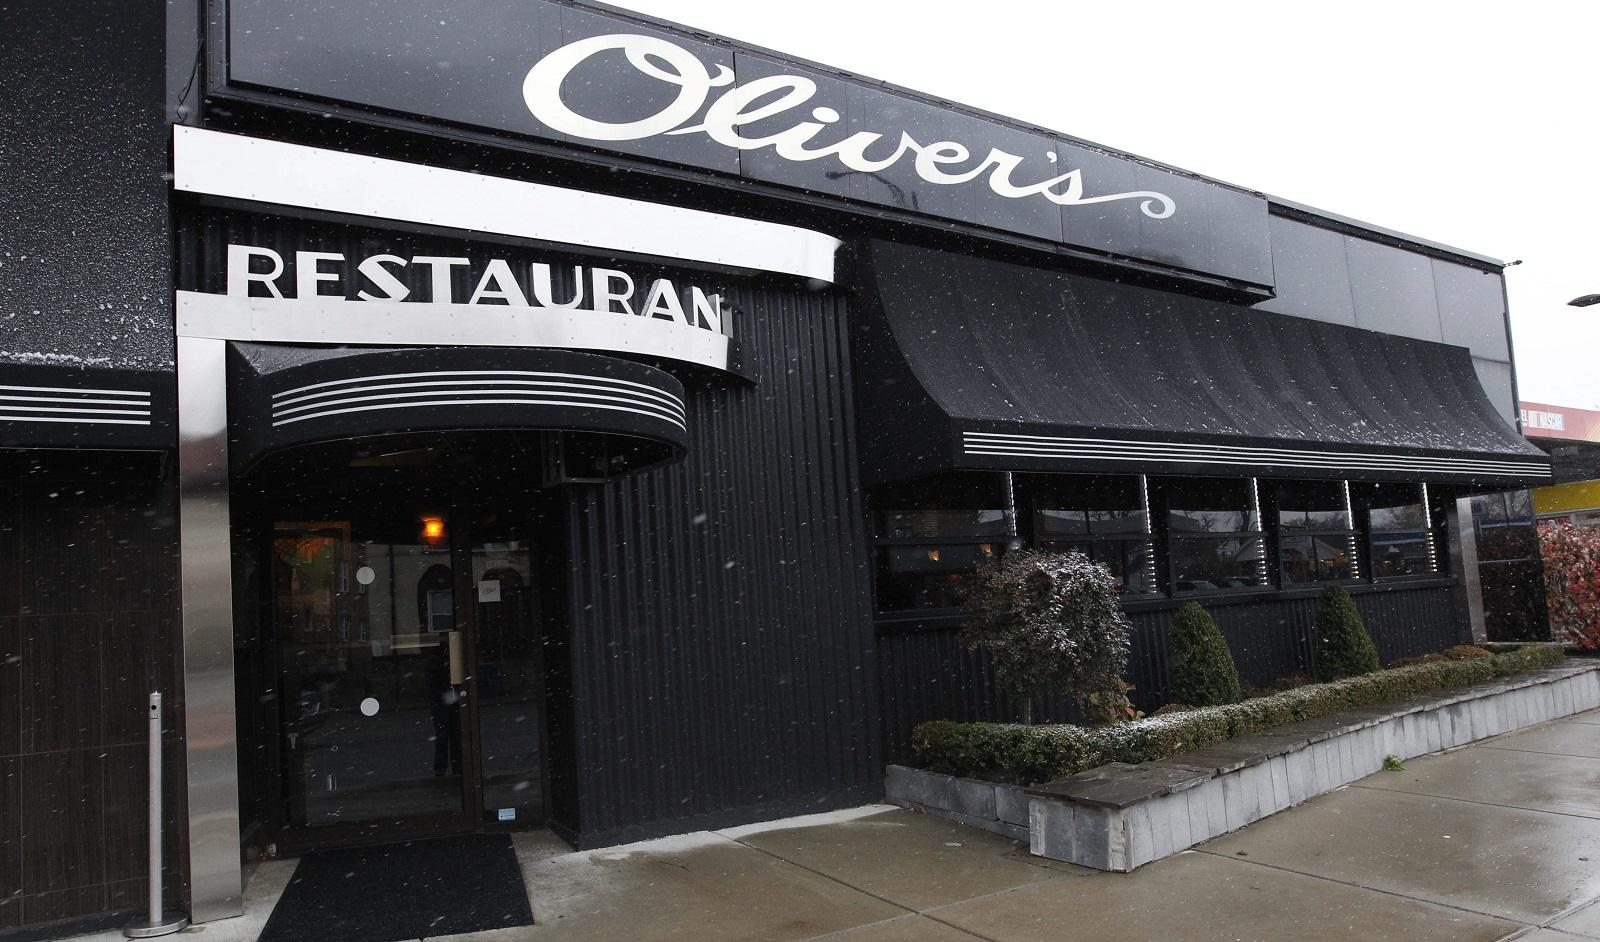 Oliver's Restaurant is located in Delaware Avenue. (Sharon Cantillon/Buffalo News file photo)